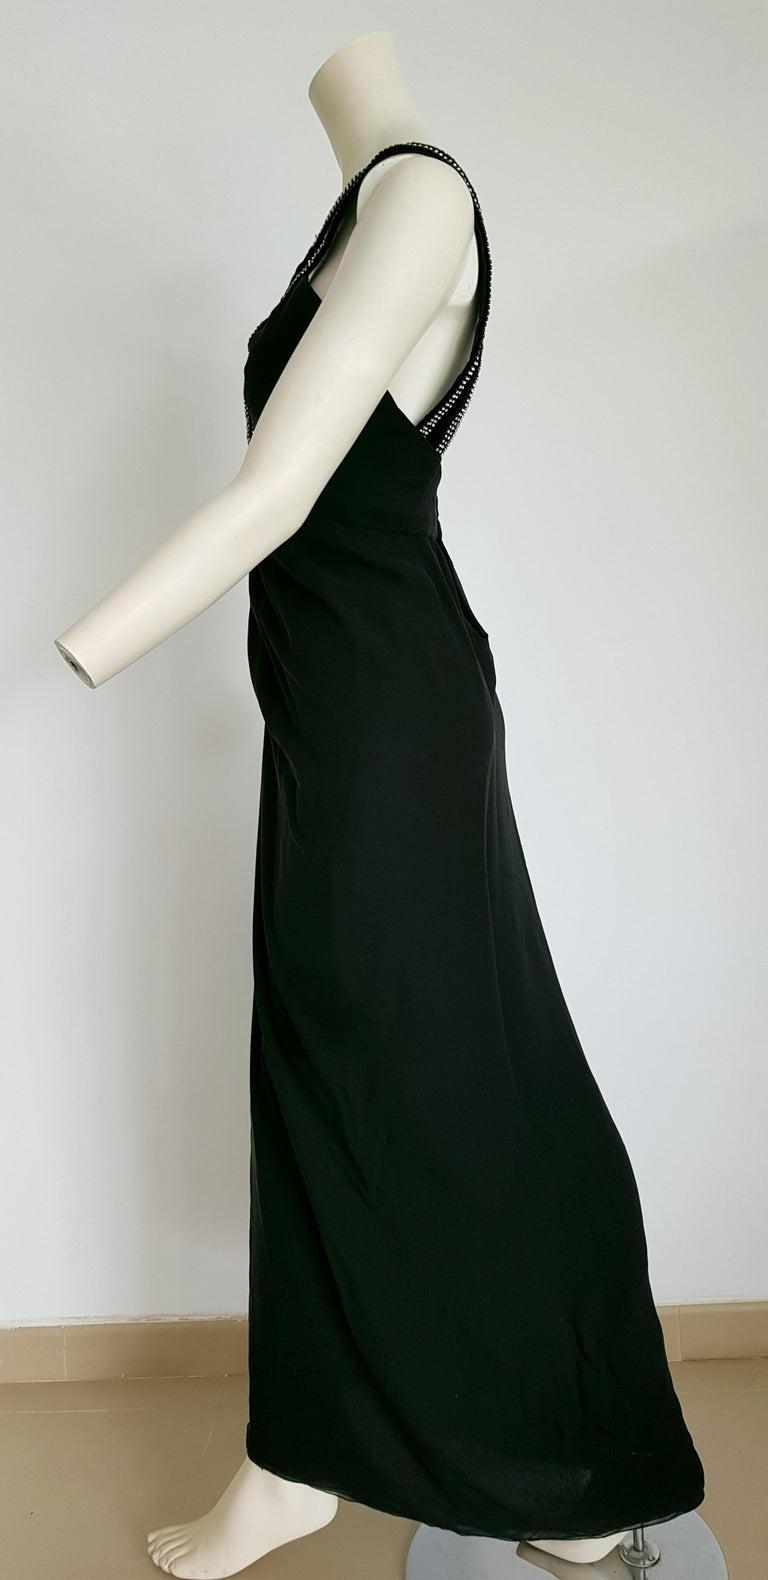 VALENTINO Haute Couture swarovski diamonds on black hems silk gown - Unworn, new In New Condition For Sale In Somo (Santander), ES